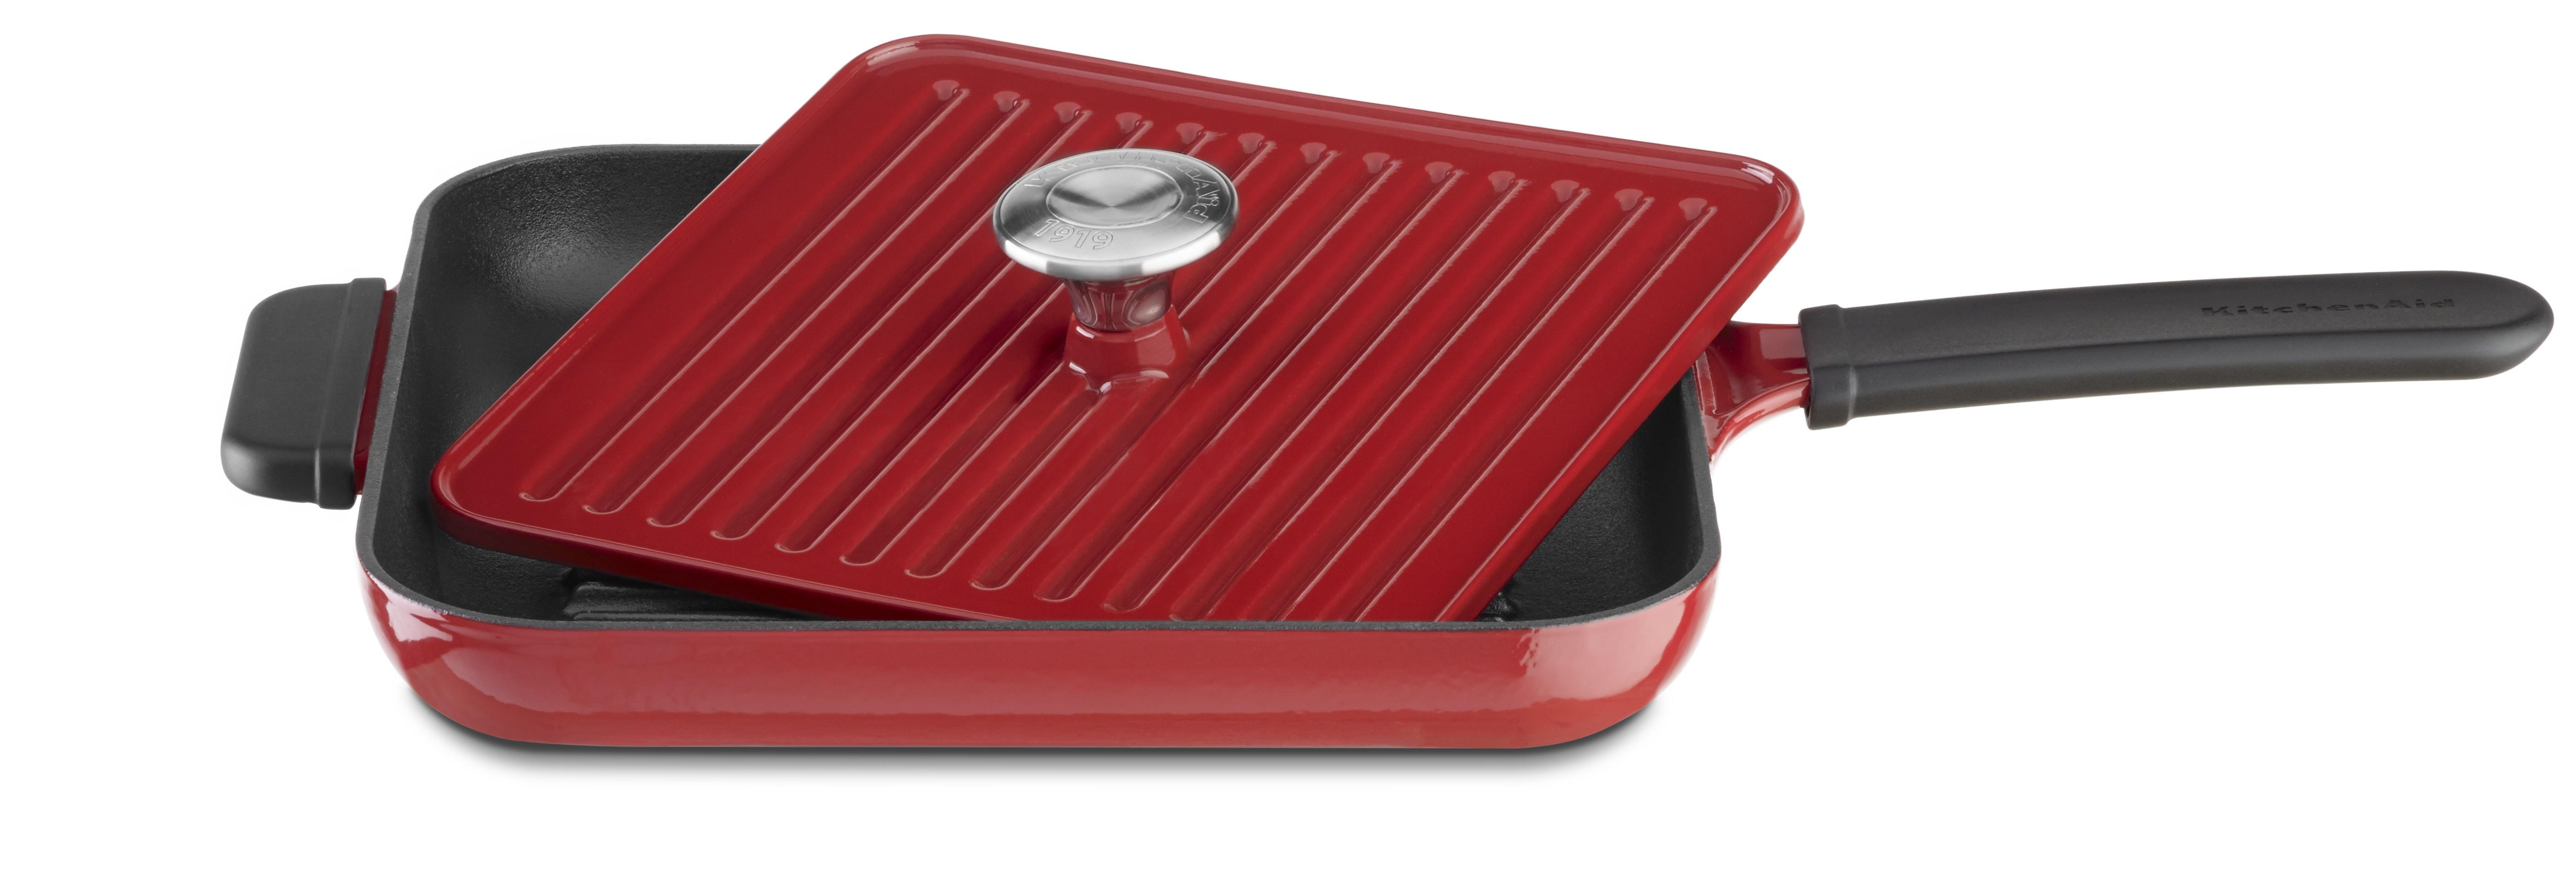 KitchenAid - Frigideira Grill Panini - R$ 599